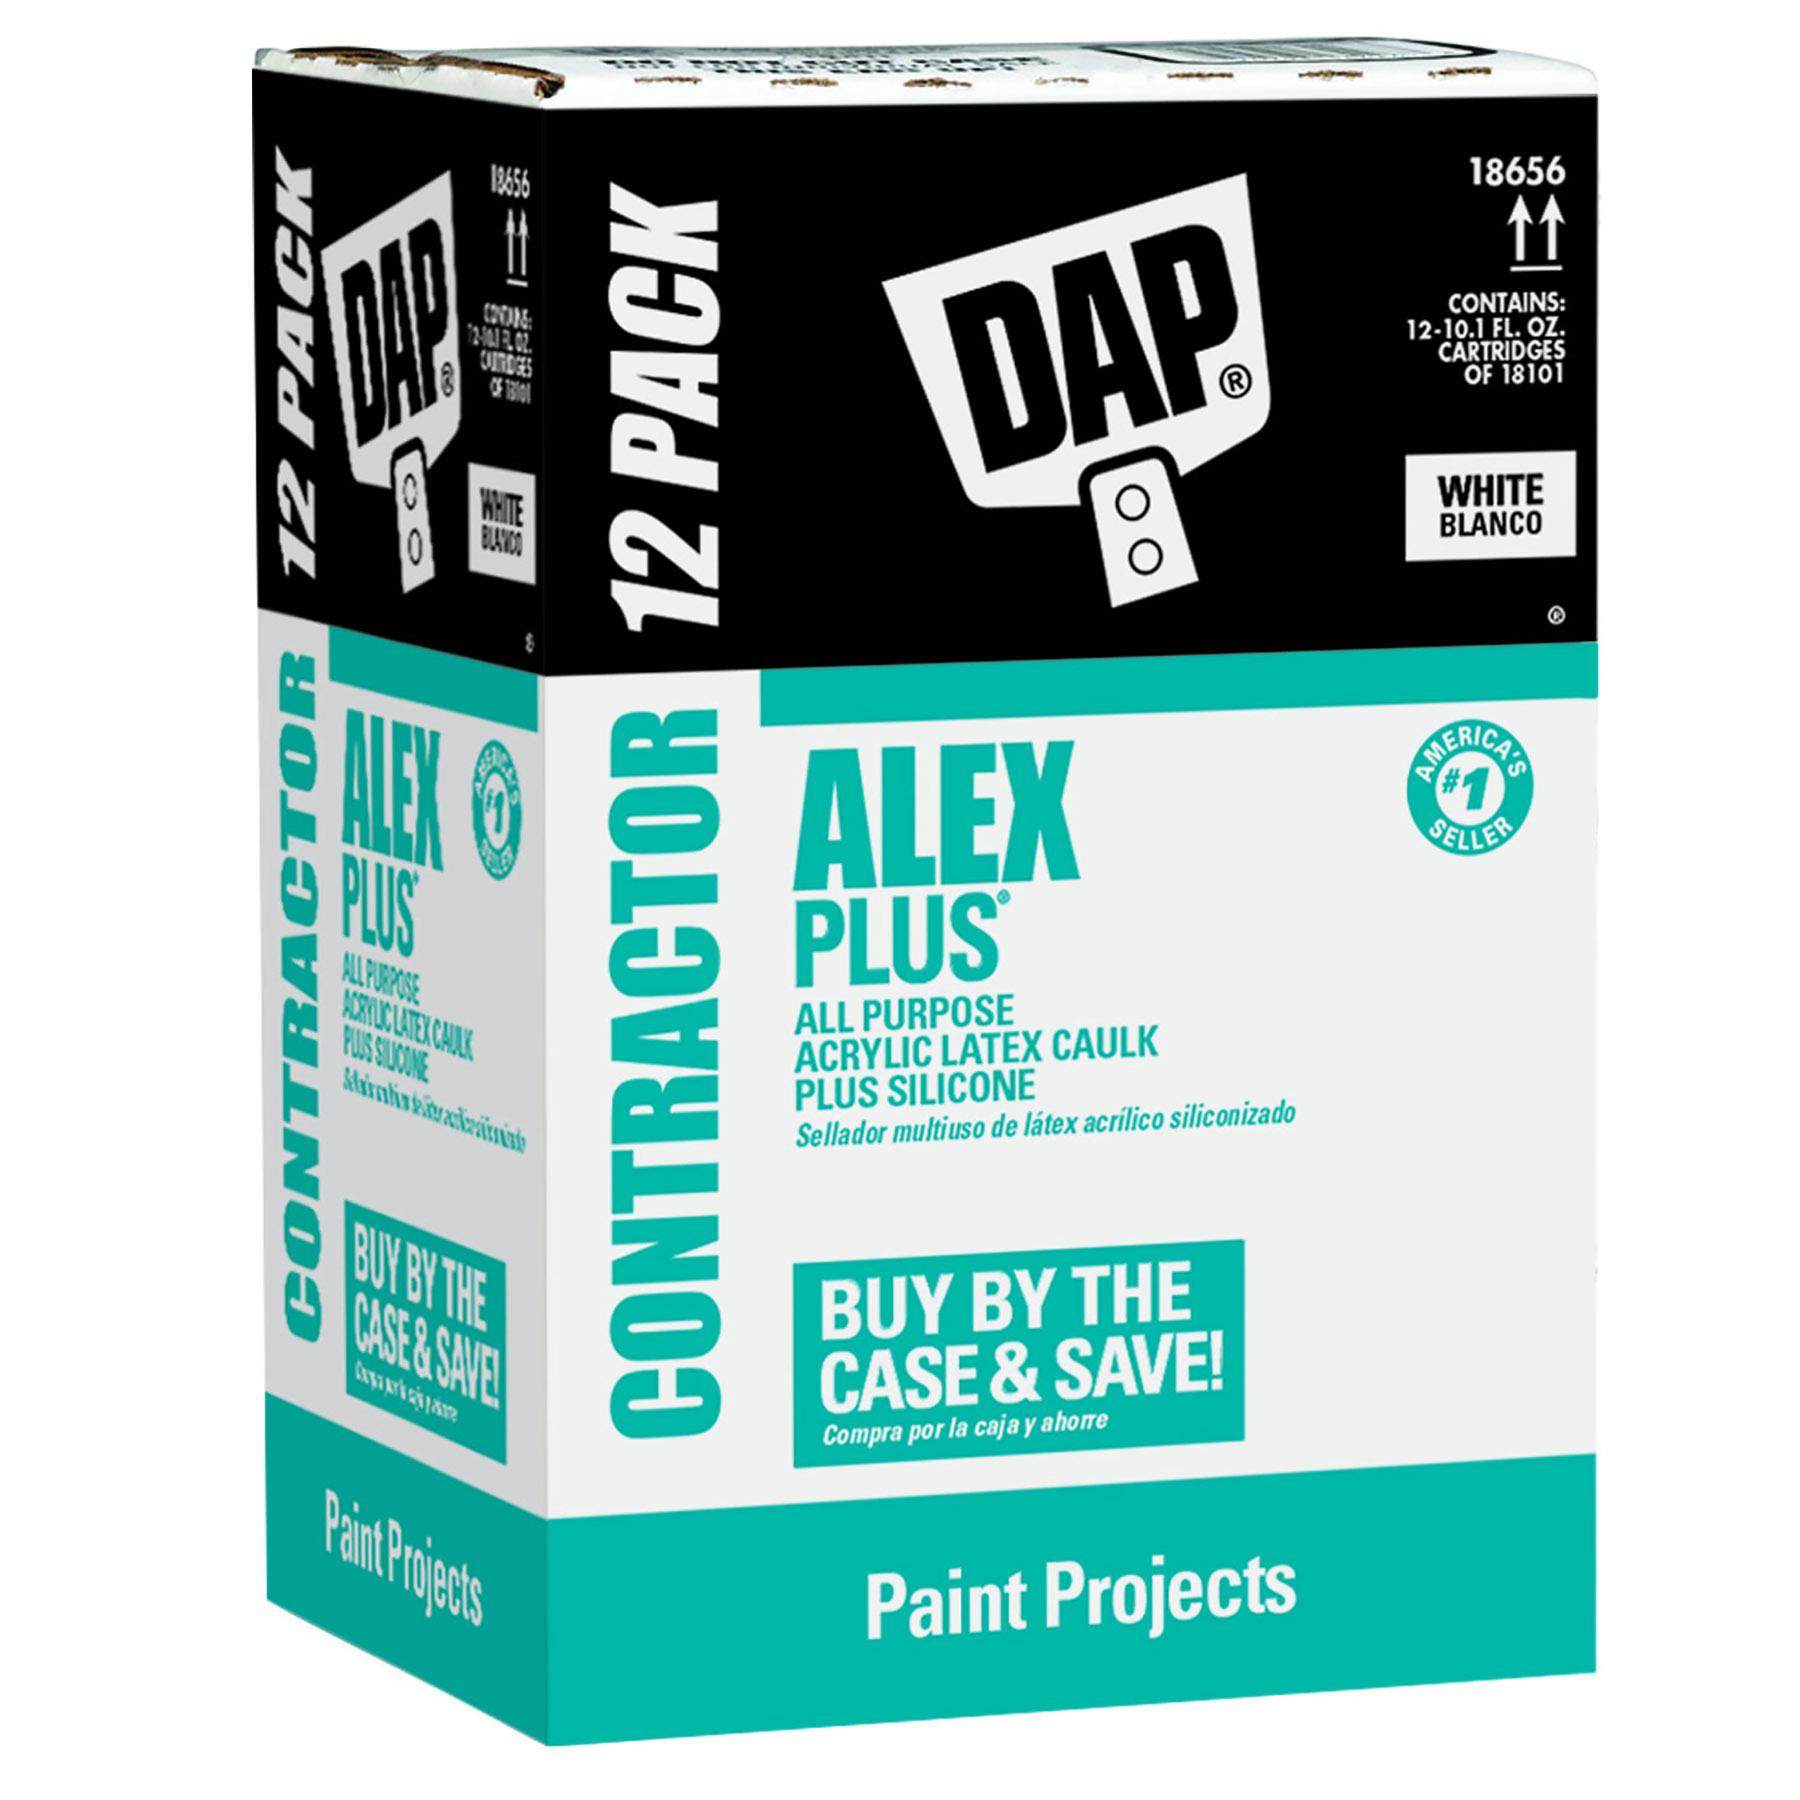 Alex Plus Caulks Sealants Latex